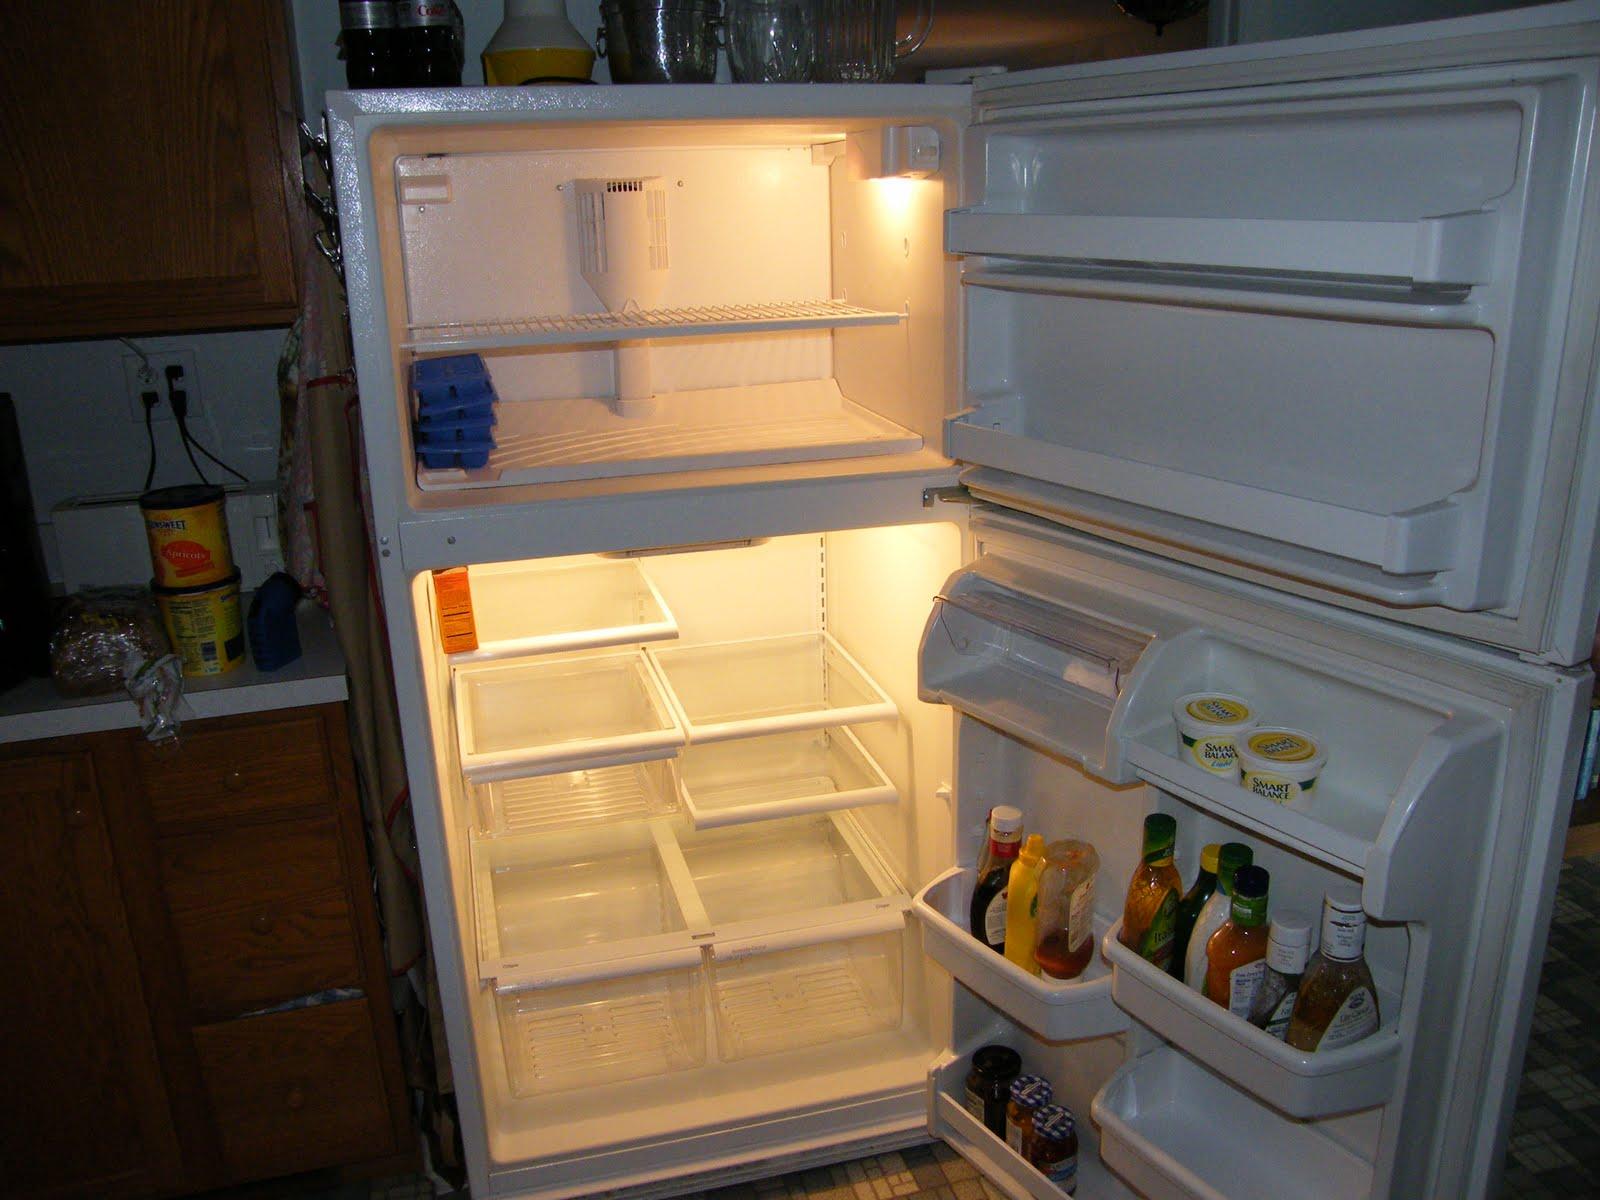 agzina-kadar-bos-buzdolabi